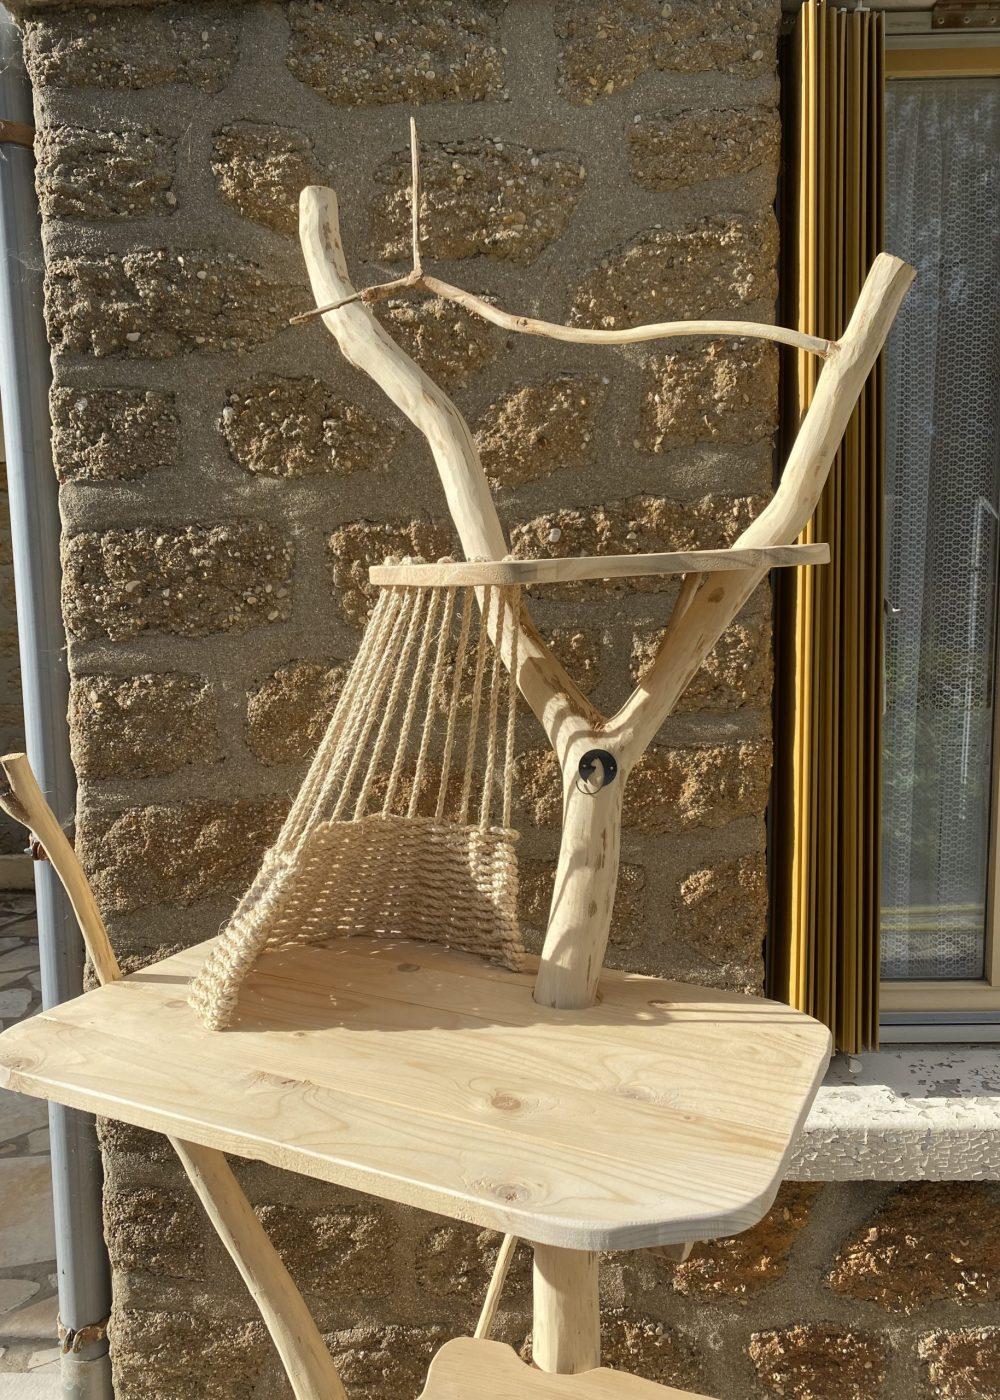 Monarbreachat Grand Format Cabane en corde 3